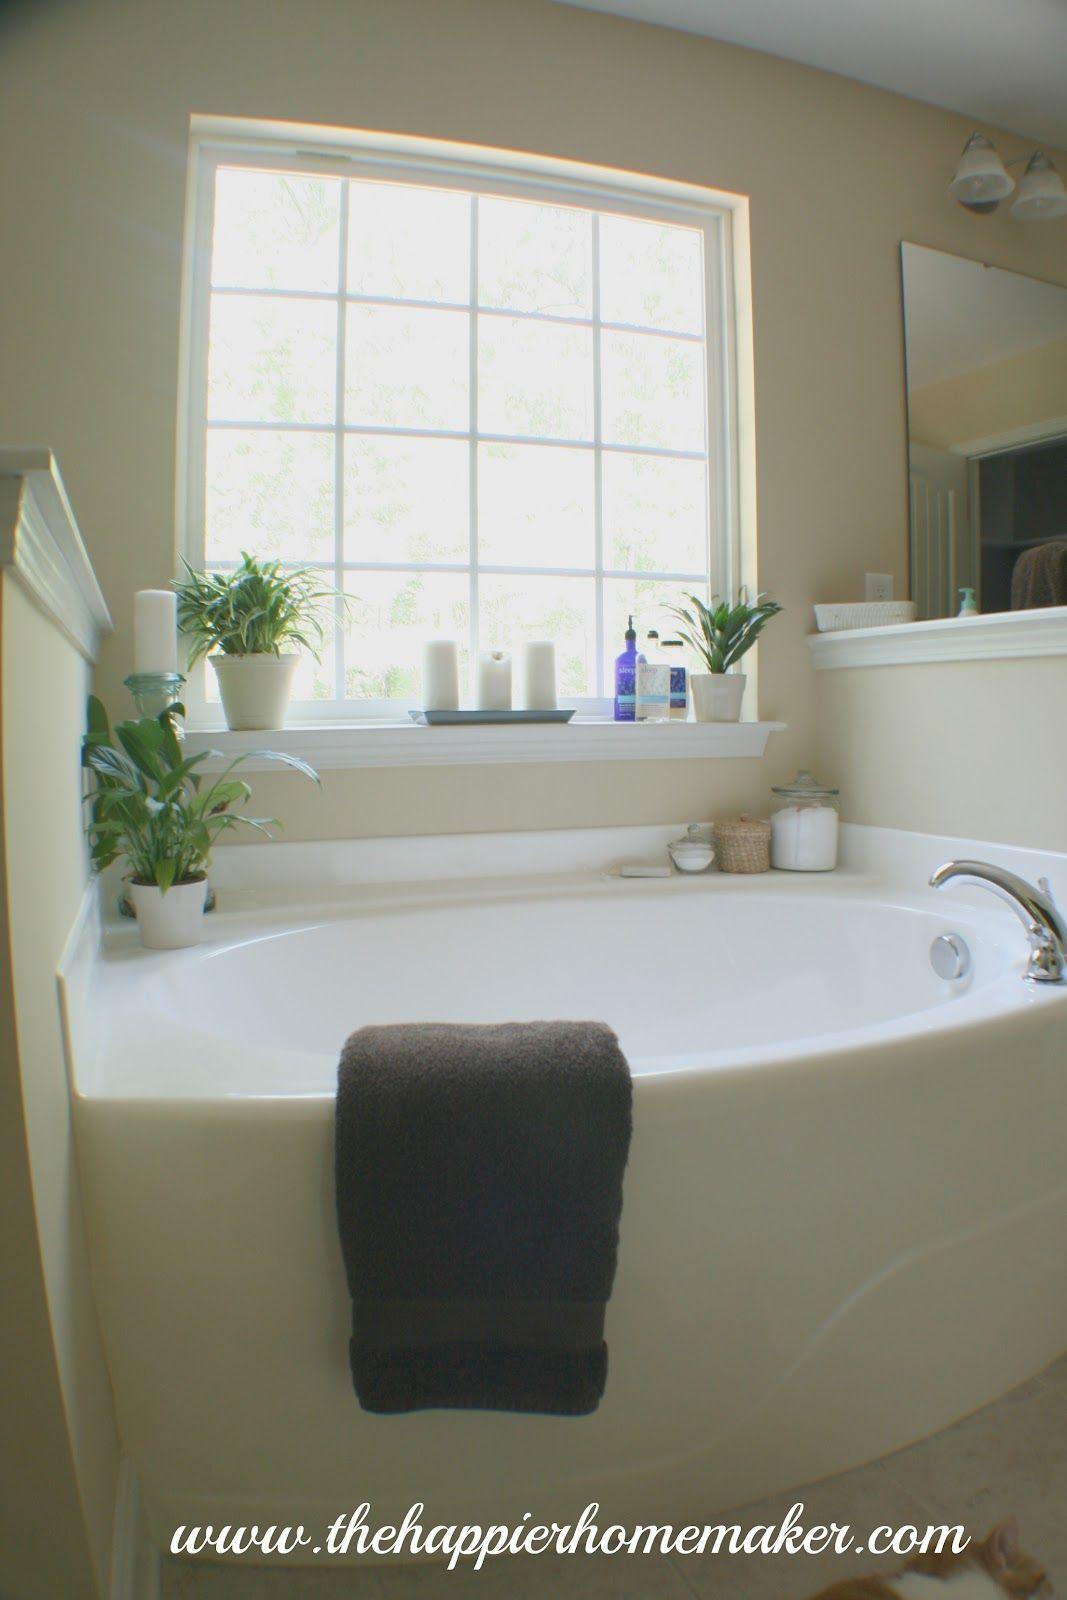 10 Garden Tub Decorating Ideas Incredible As Well As Beautiful Bathtub Decor Garden Tub Decorating Bathroom Wall Decor